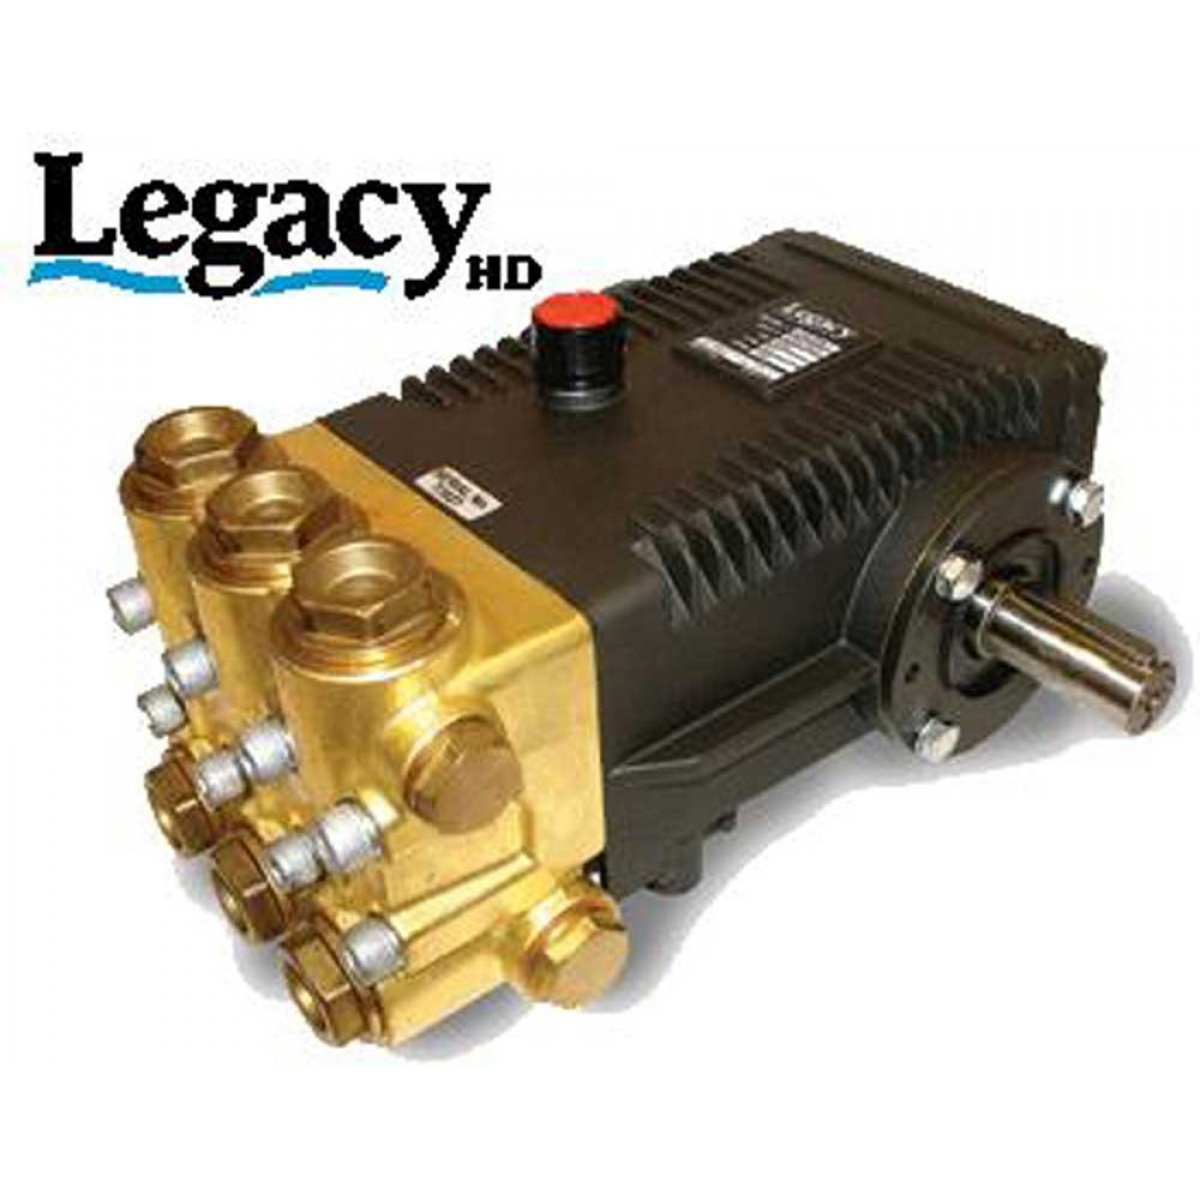 Pump, Legacy Gx8030r.1, 8@3000 1460rpm